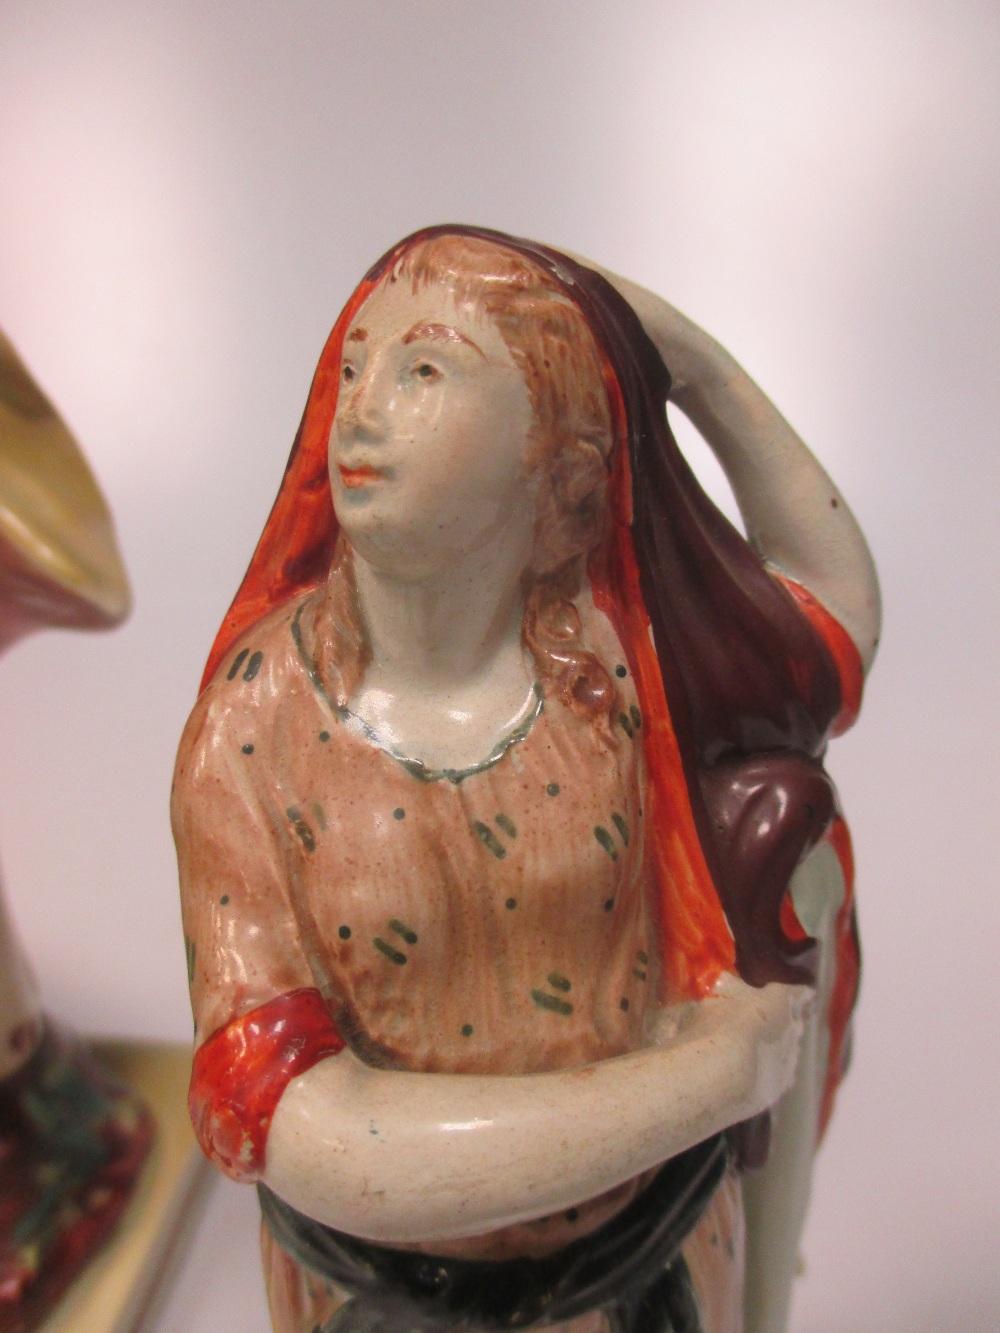 Lot 26 - A Walton pearlware figure of a lady archer, a Staffordshire pearlware figure of 'Plenty', two